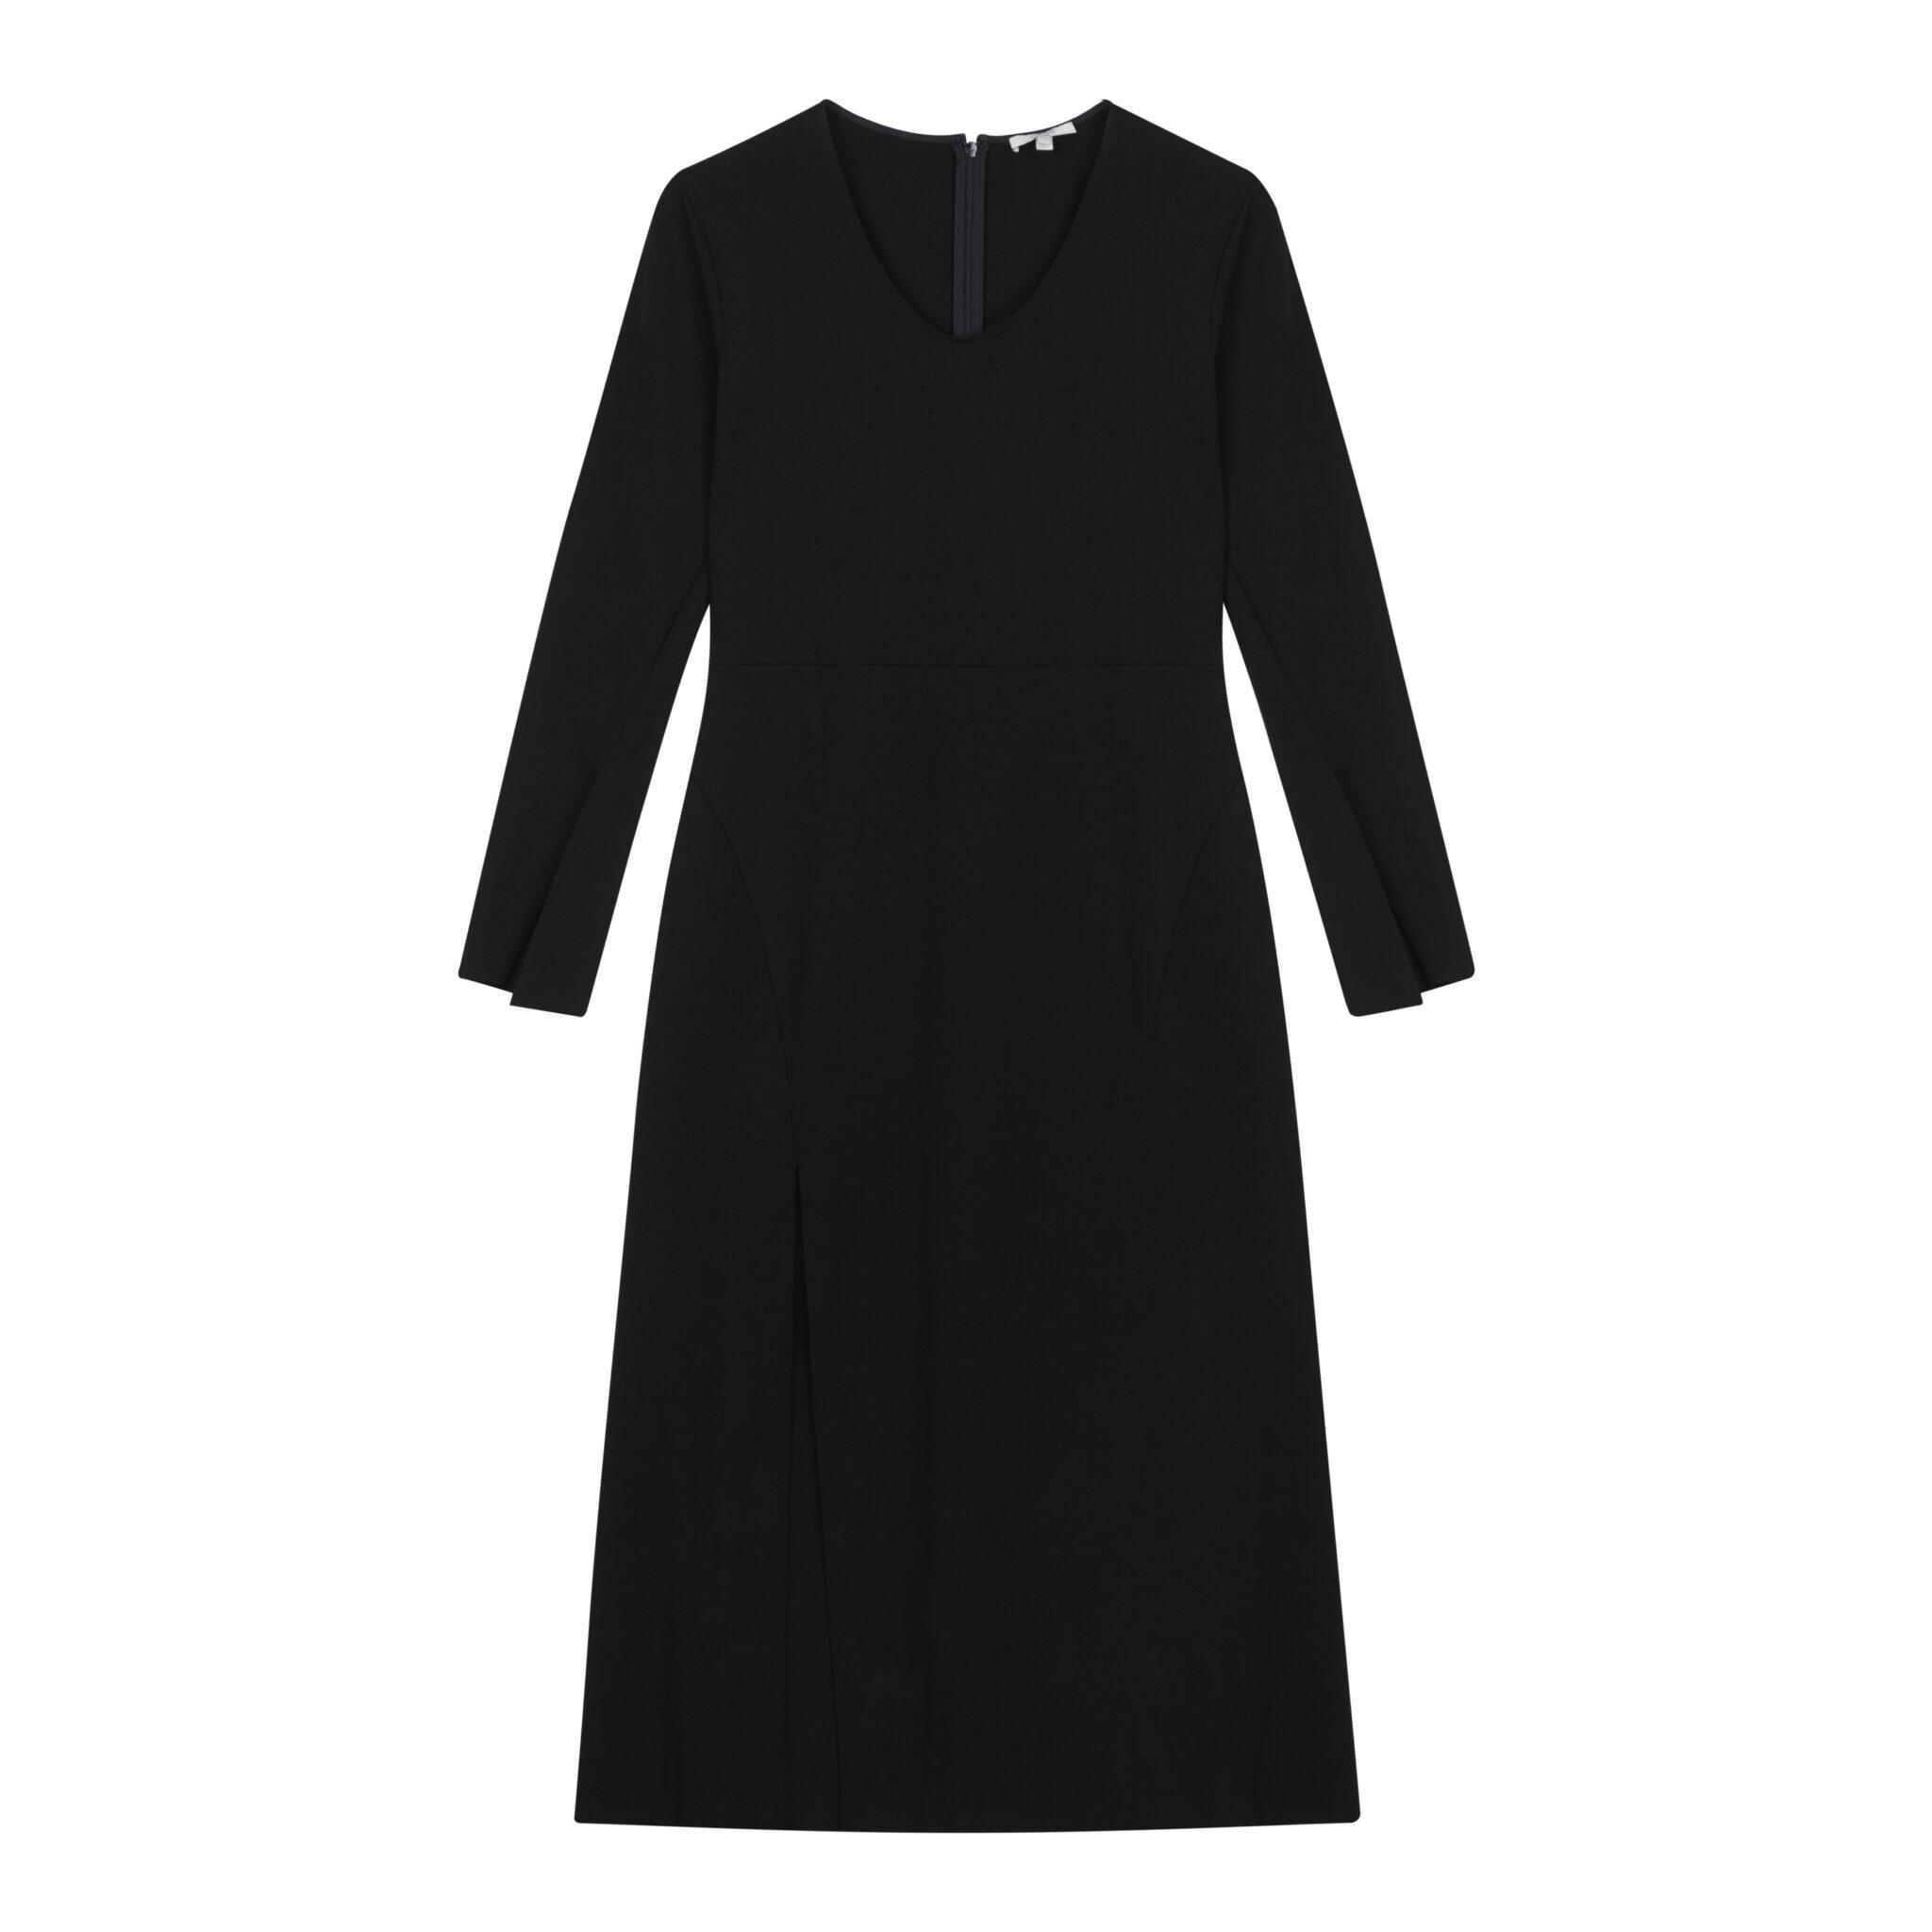 Milana_dress_Black_dagmar